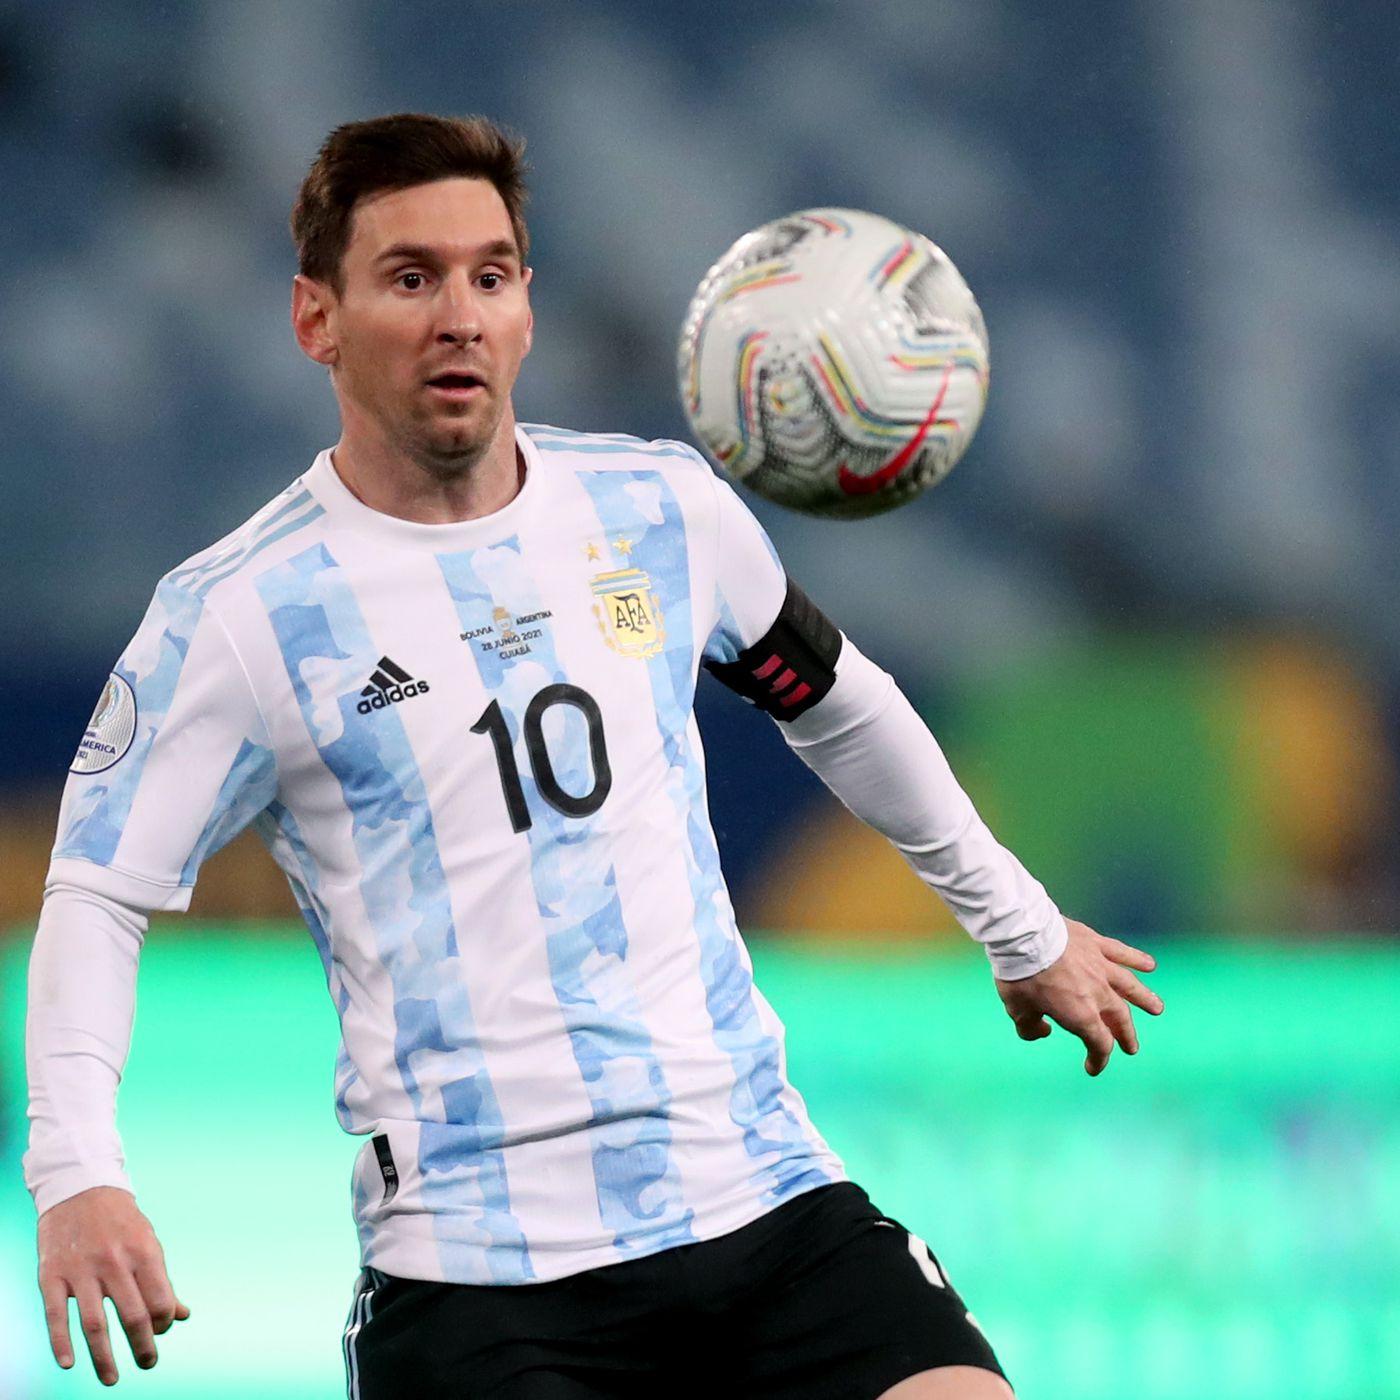 Messi Antar Argentina ke Semi Final Copa Amerika Usai Lumat Ekuador 3-0